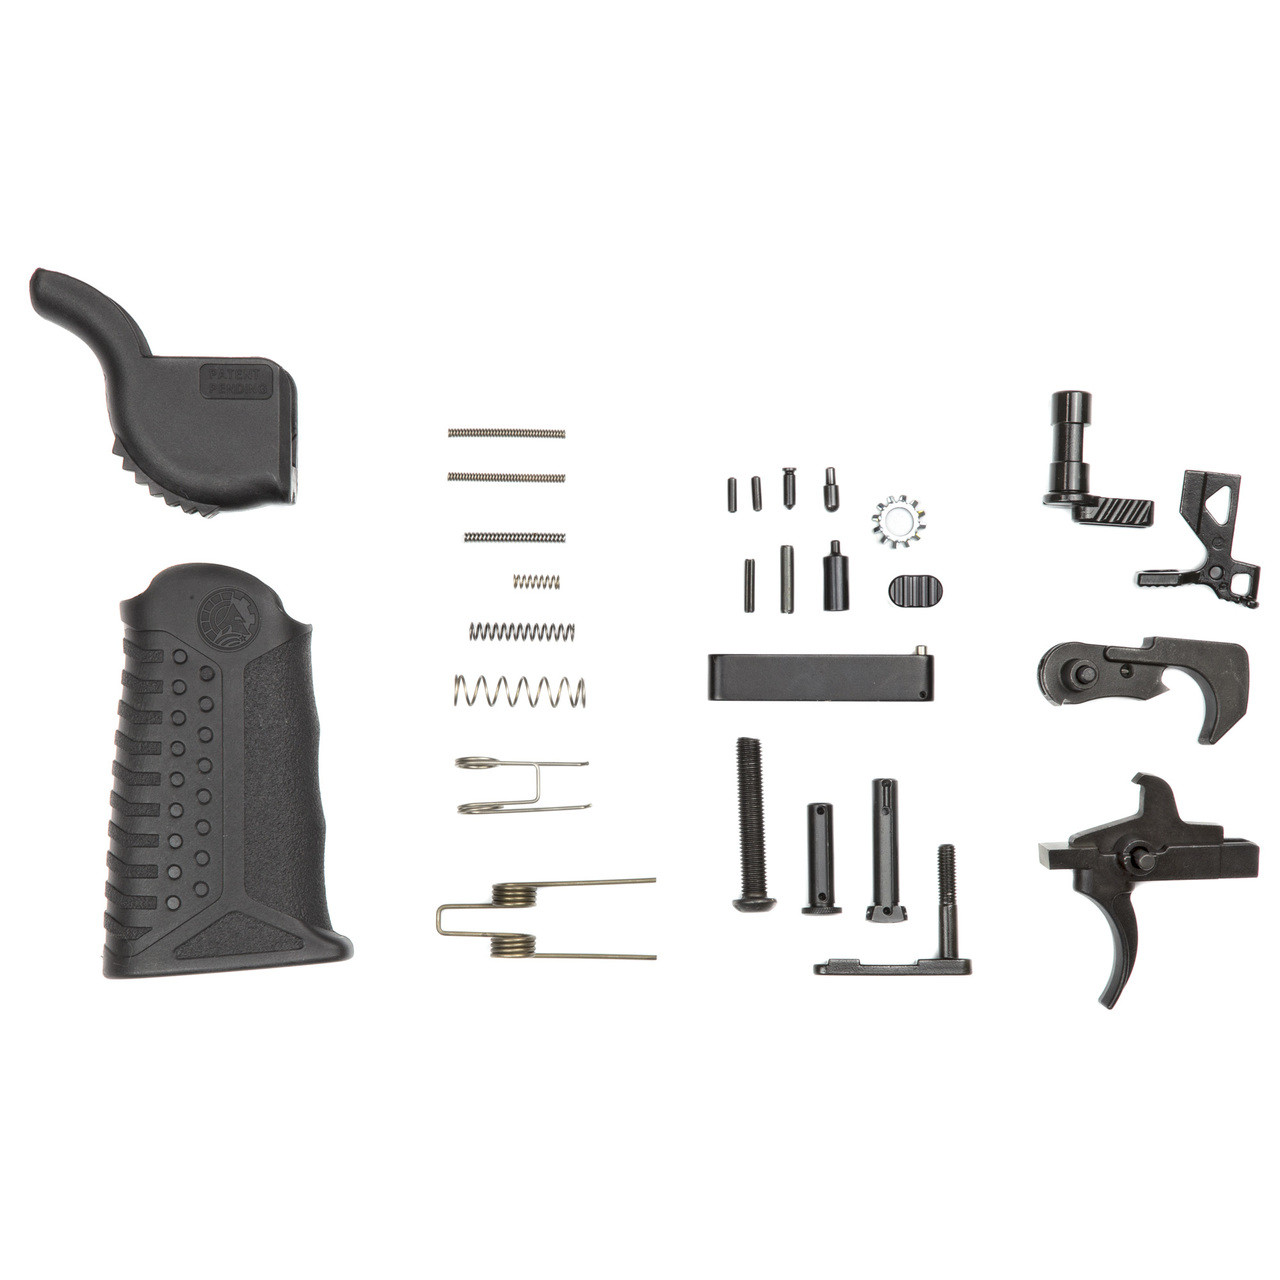 BATTLE ARMS DEVELOPMENT Enhanced AR-15 Lower Parts Kit